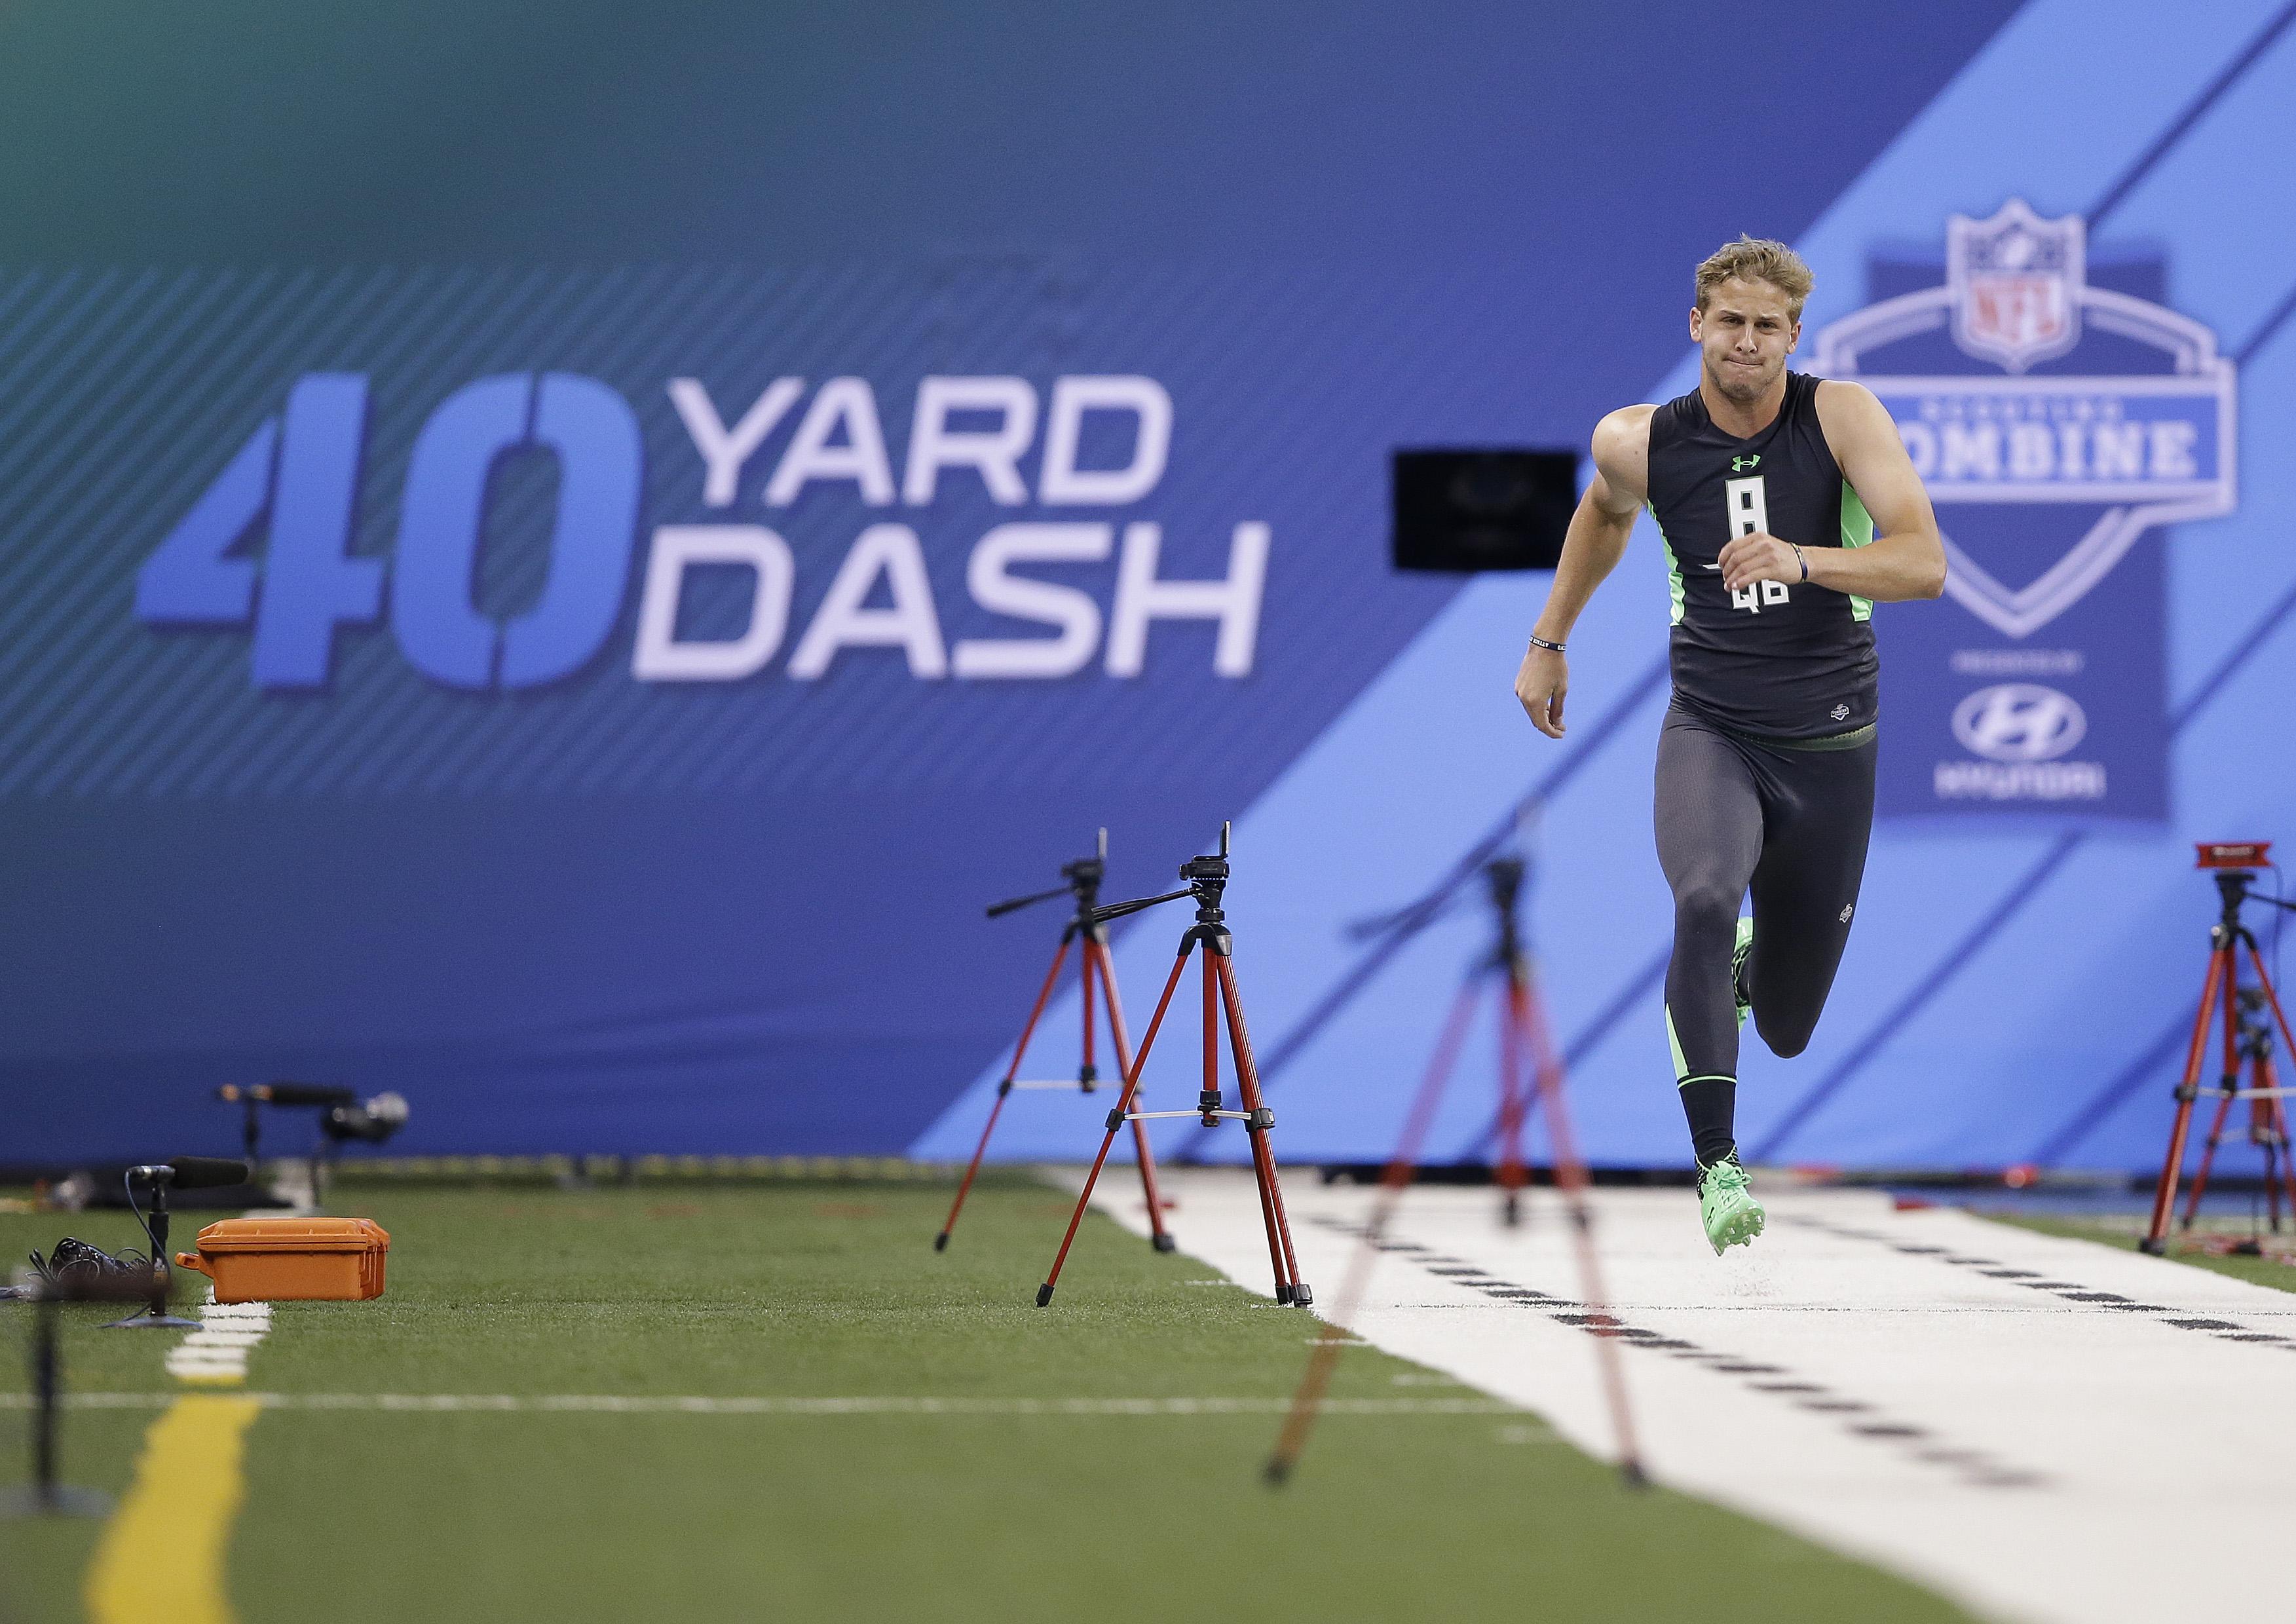 California quarterback Jared Goff runs the 40-yard dash at the NFL football scouting combine in Saturday, Feb. 27, 2016, in Indianapolis. (AP Photo/Darron Cummings)